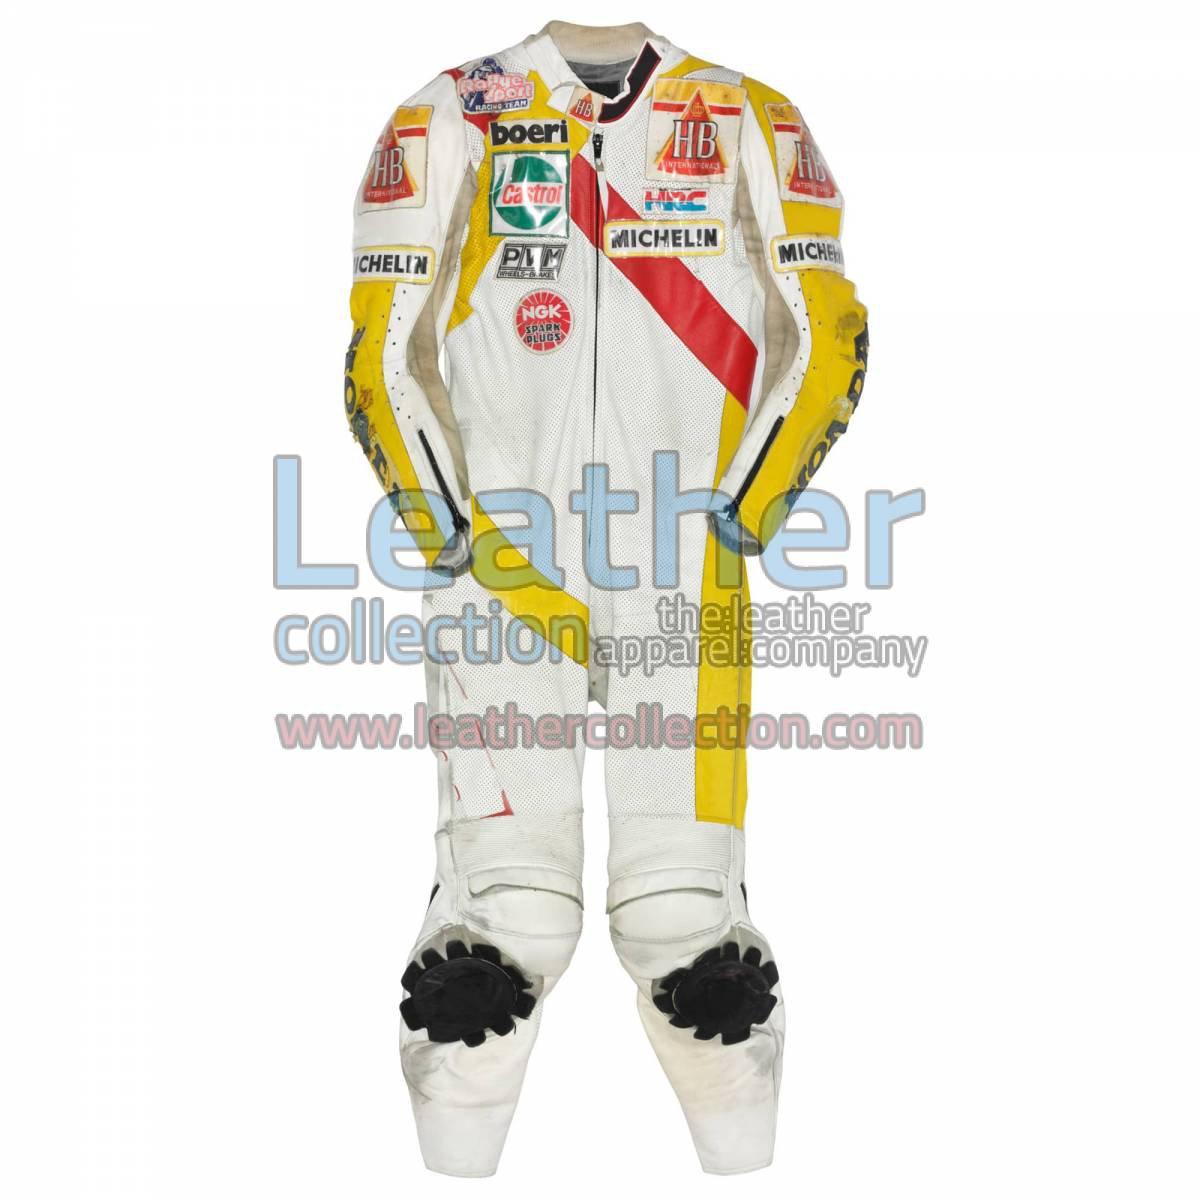 Helmut Bradl HB Honda GP 1989 Motorcycle Leathers